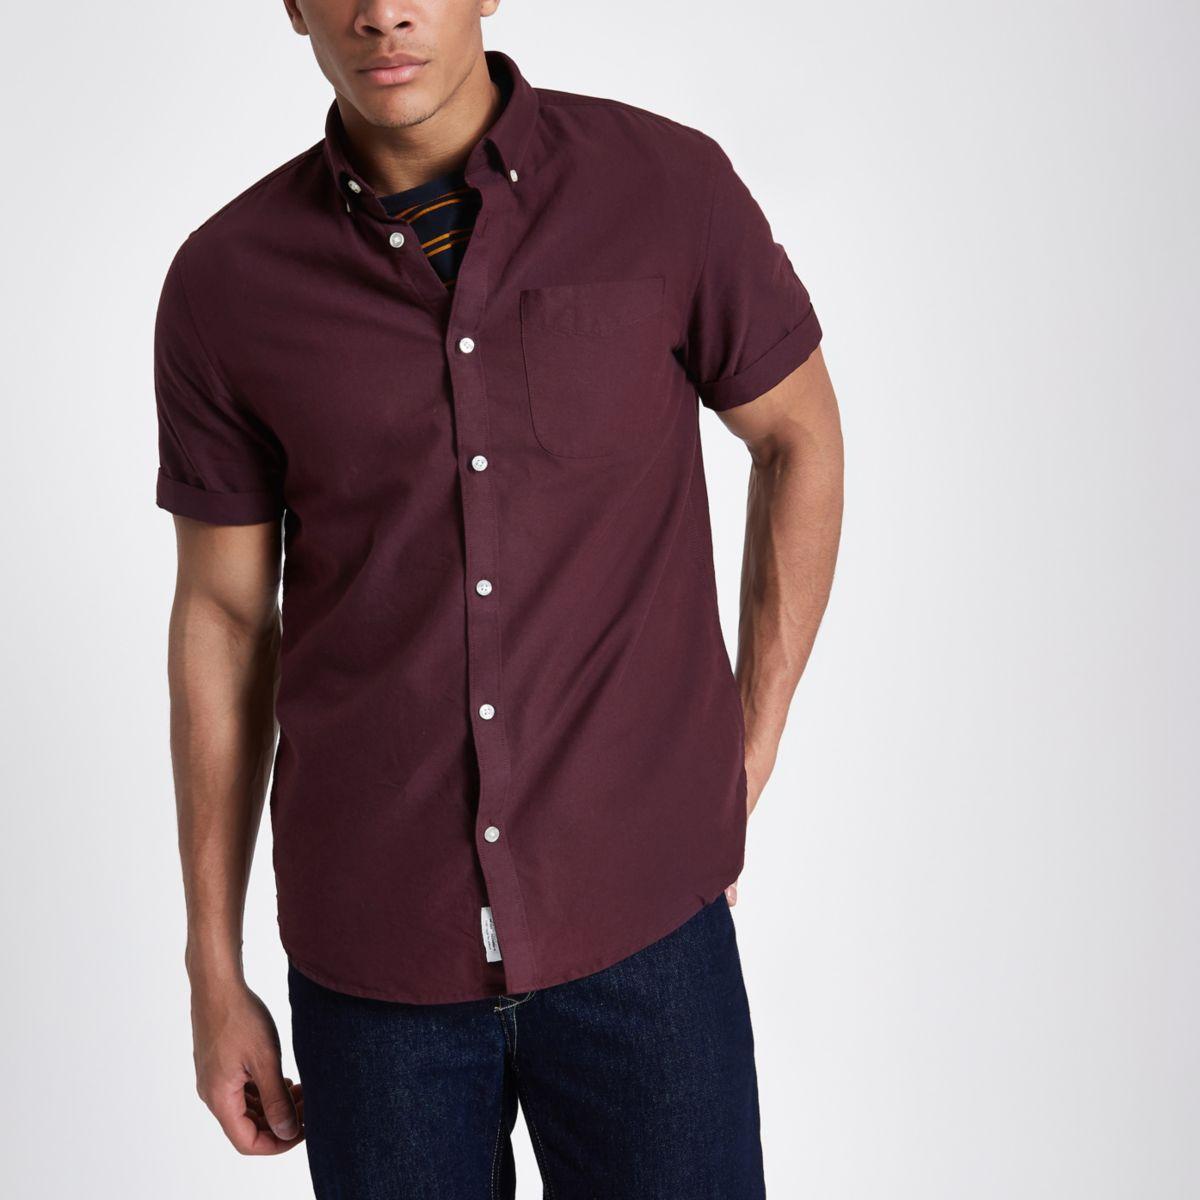 Dark red casual short sleeve Oxford shirt